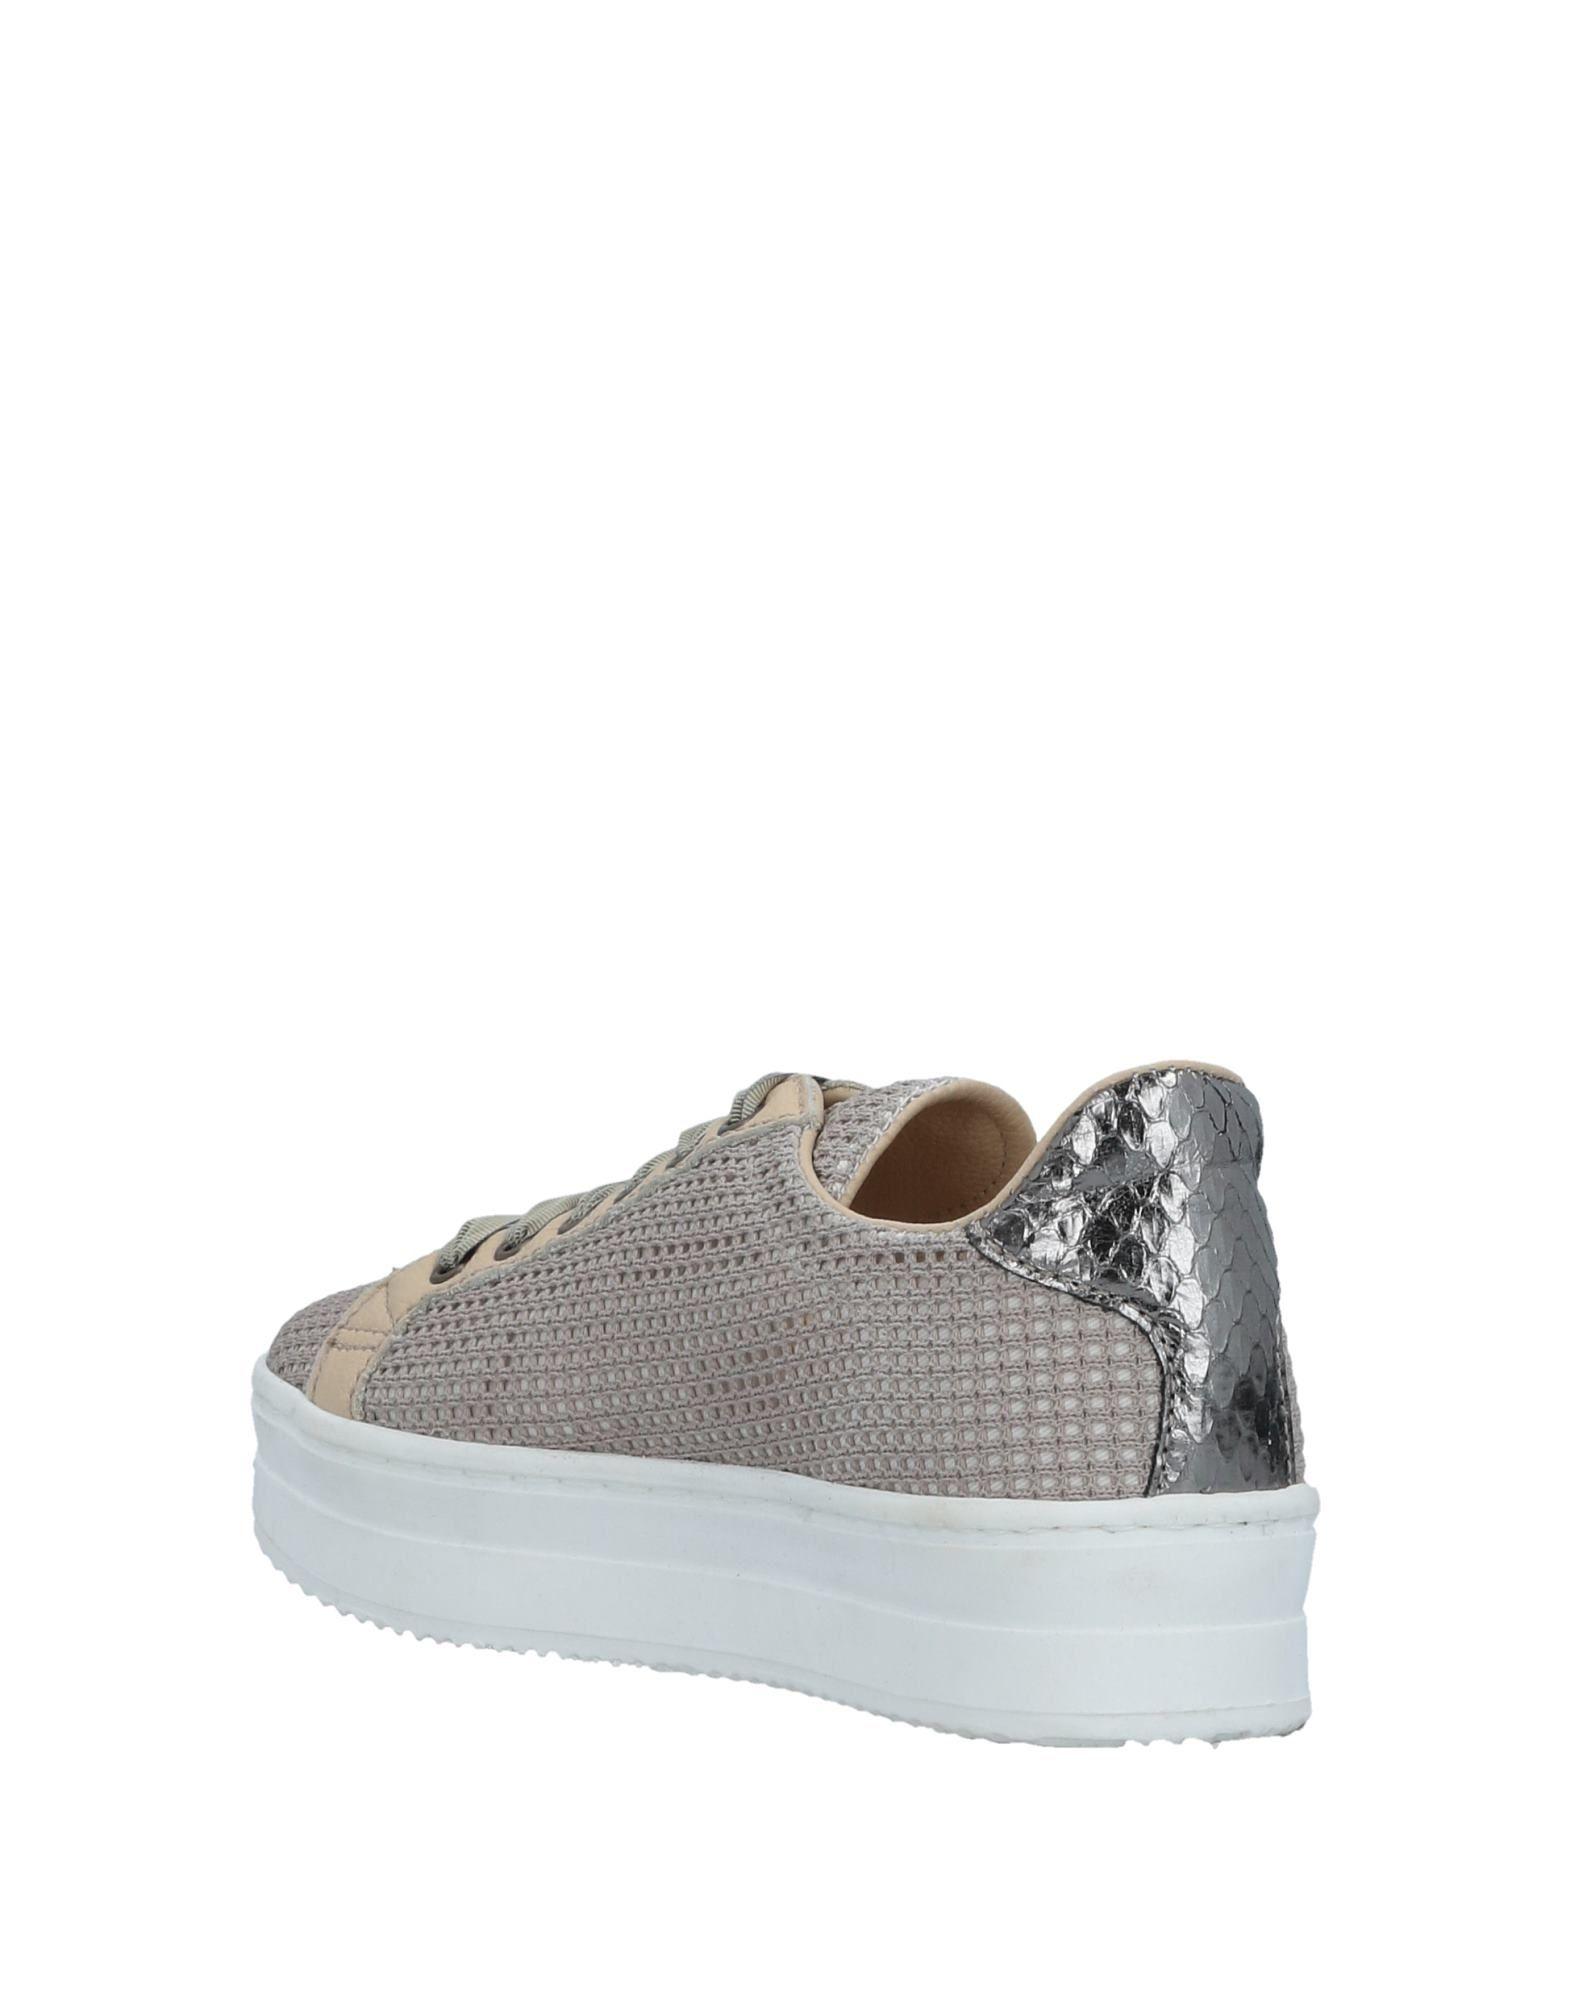 Cividini Sneakers Damen aussehende  11522356SVGut aussehende Damen strapazierfähige Schuhe 710e6e